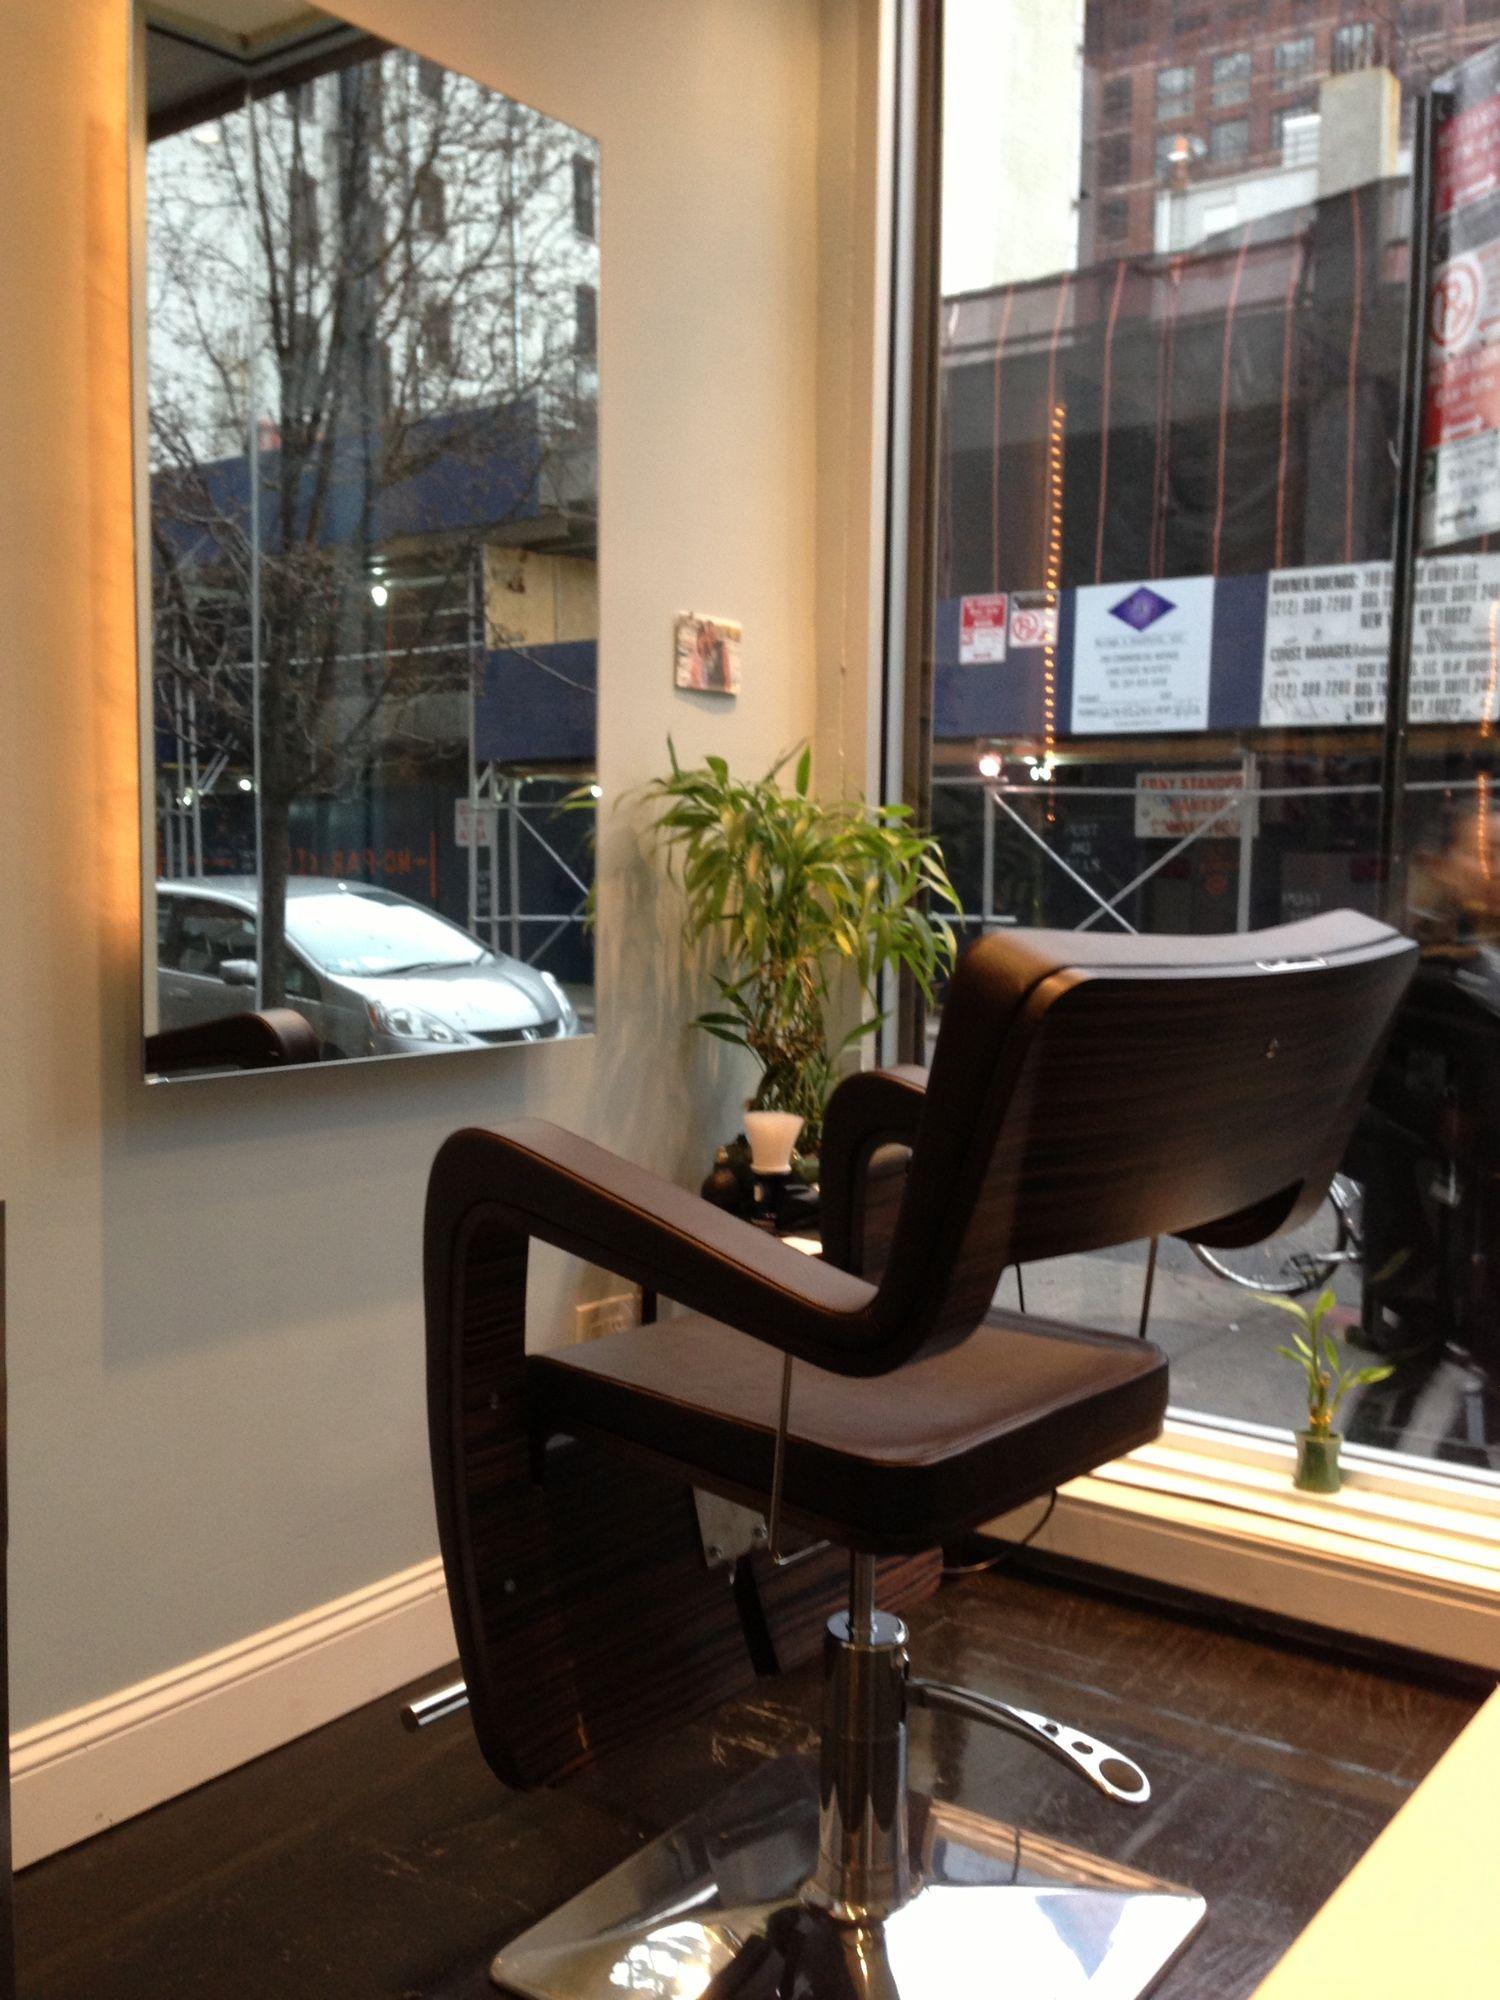 Salon Style New Yorkais massimo salon, new york, ny | salon decor, home decor, decor